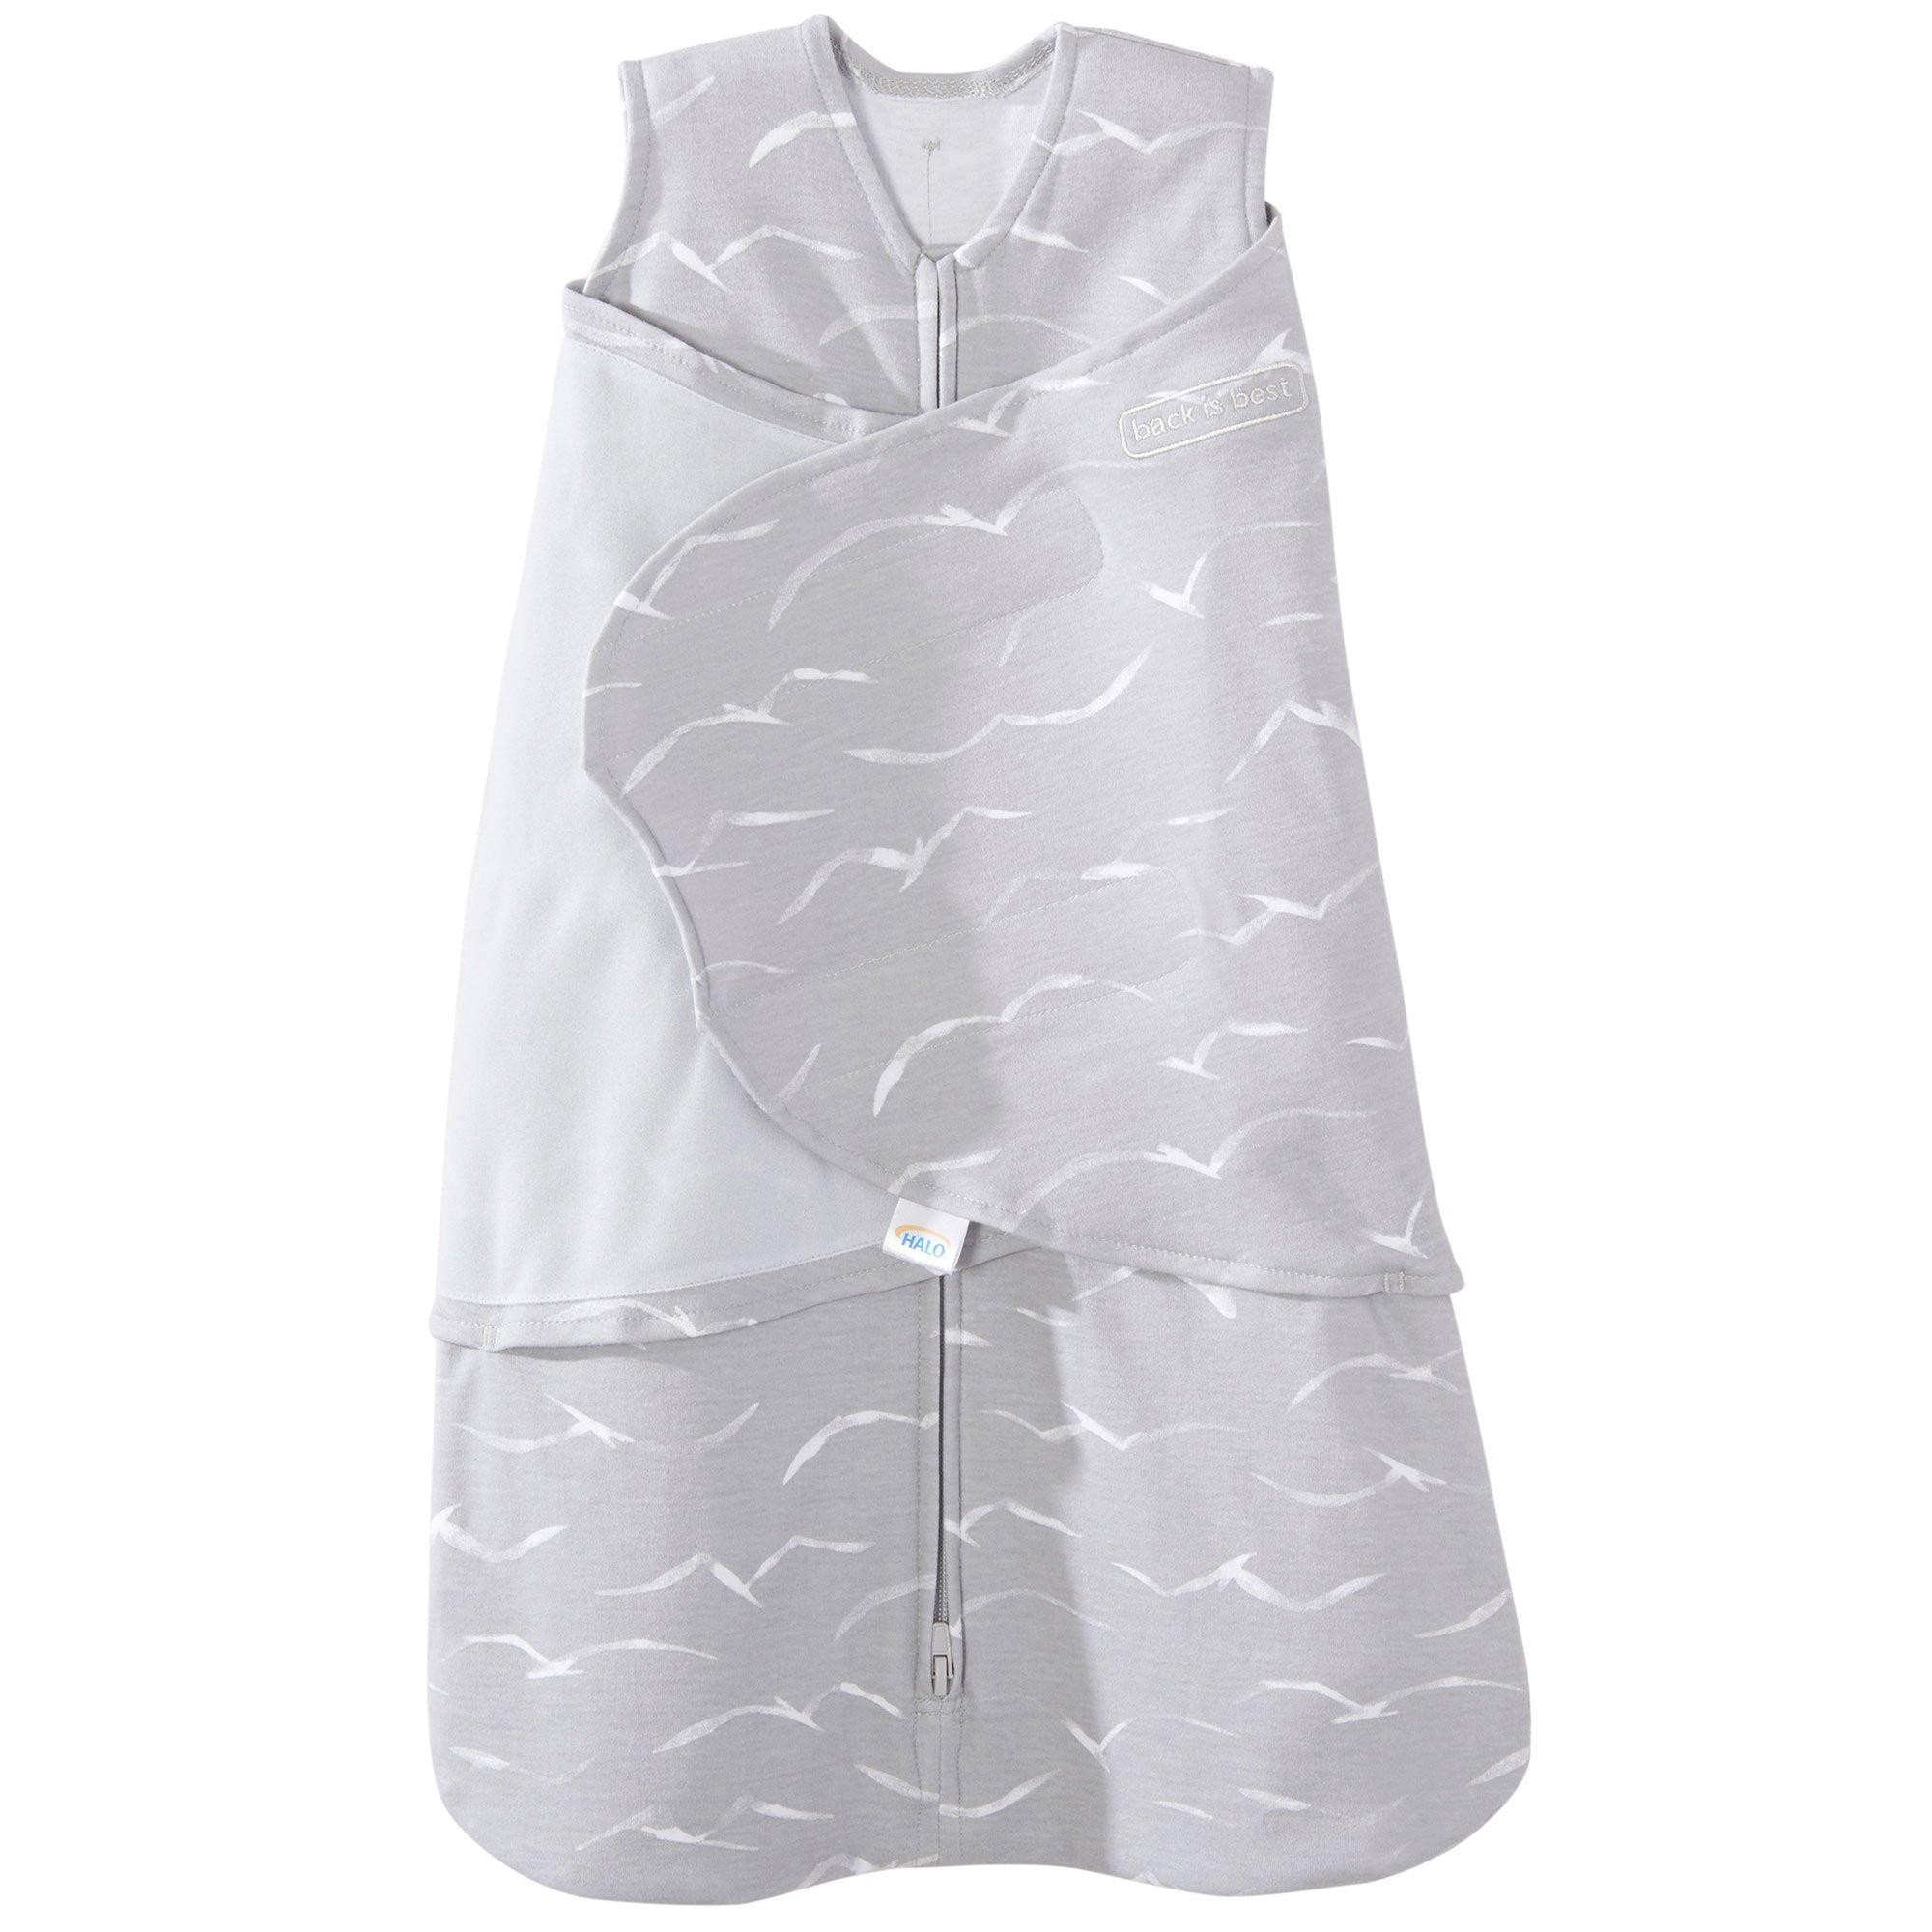 Halo 100% Cotton Sleepsack Swaddle Wearable Blanket, Grey Birds, Newborn